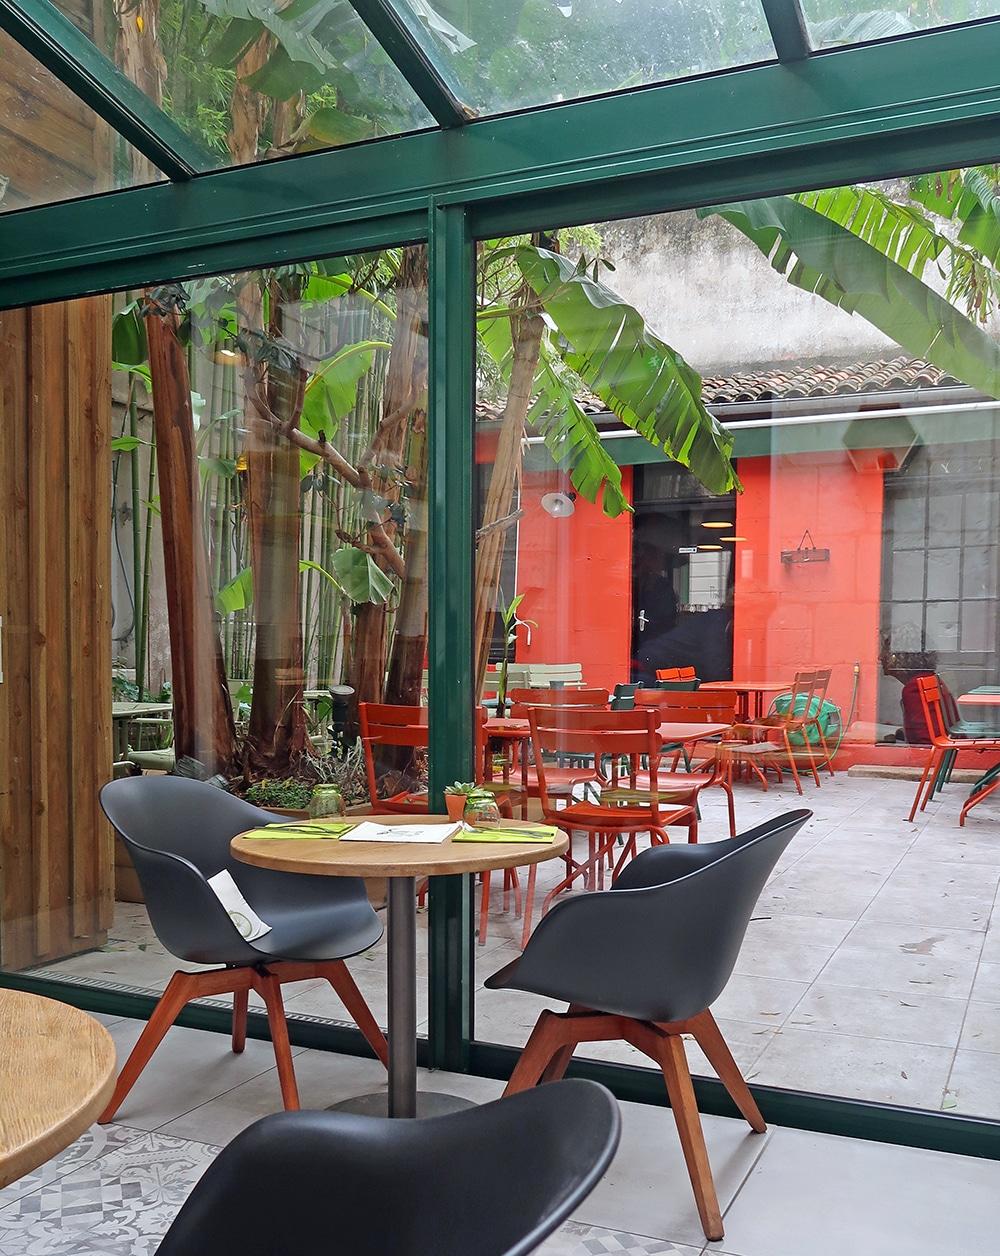 le jardin du march la rochelle top knot and tea cups. Black Bedroom Furniture Sets. Home Design Ideas